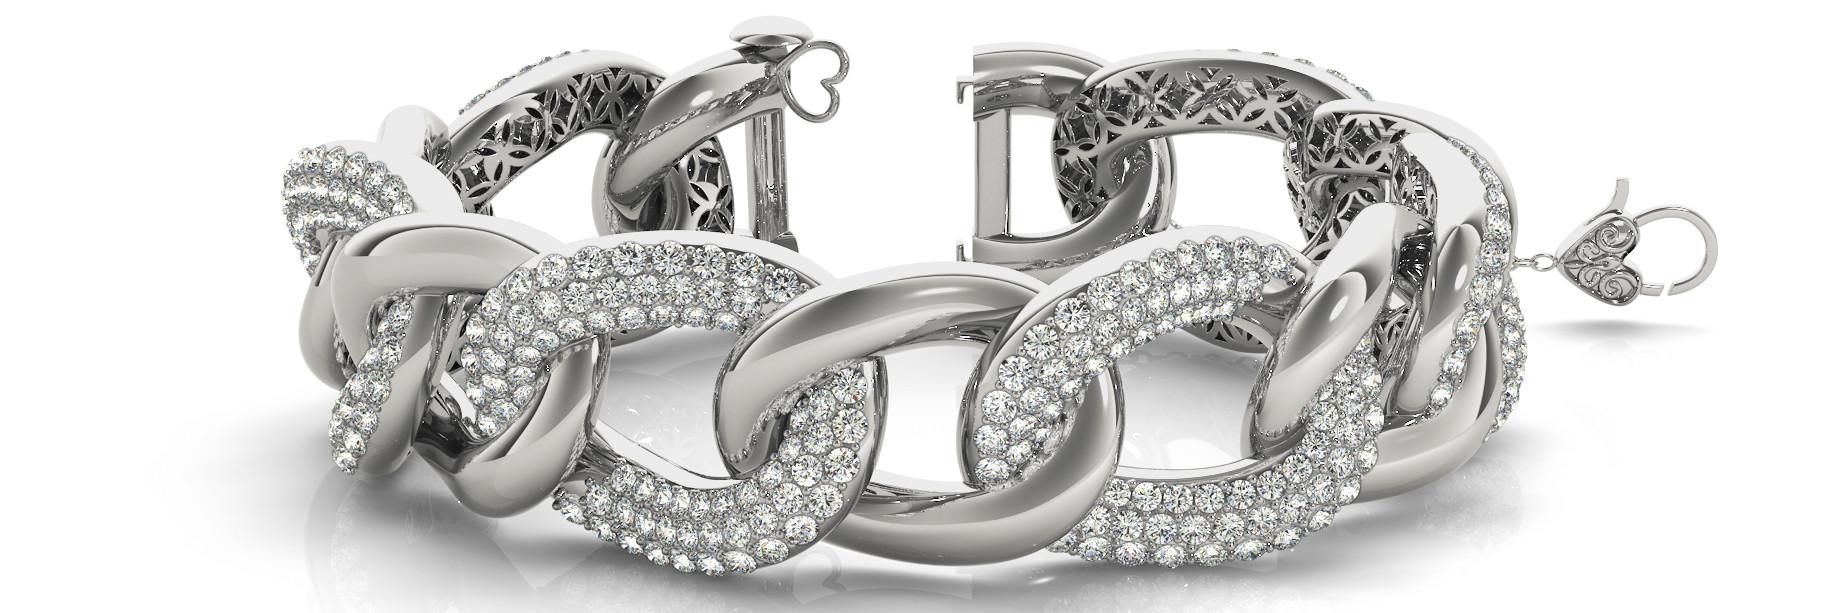 Bracelet Italian Made <p></p><p>Length - 7.25 Inch</p><p>Width - .75 Inch</p>